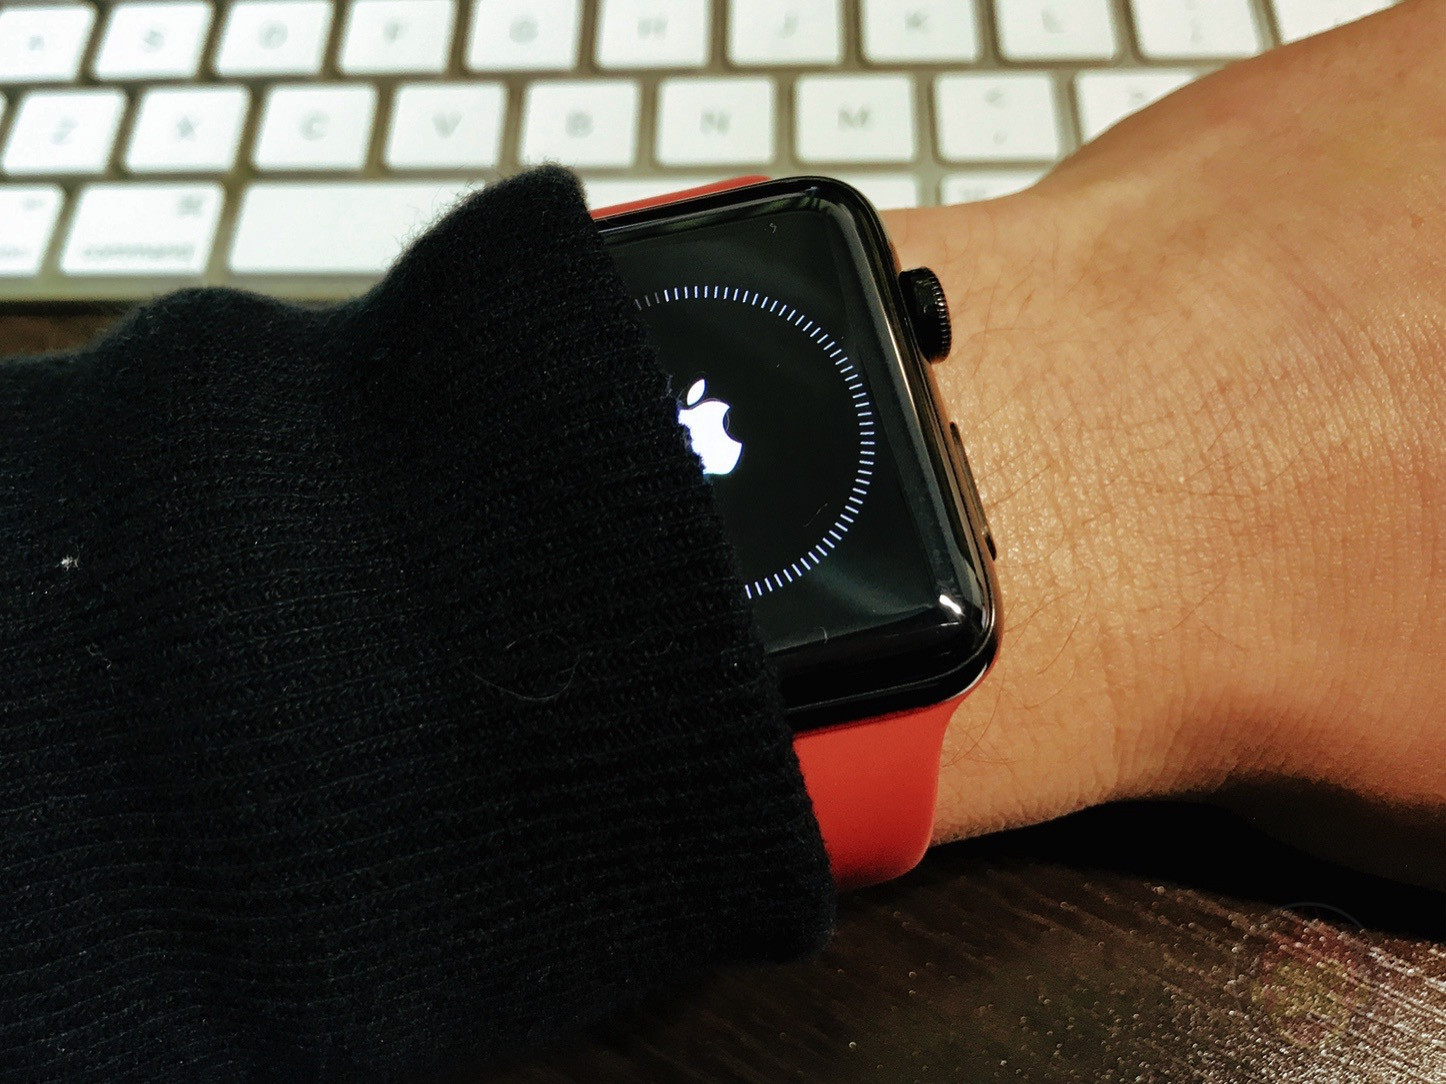 Resetting-my-Apple-Watch-01.jpg